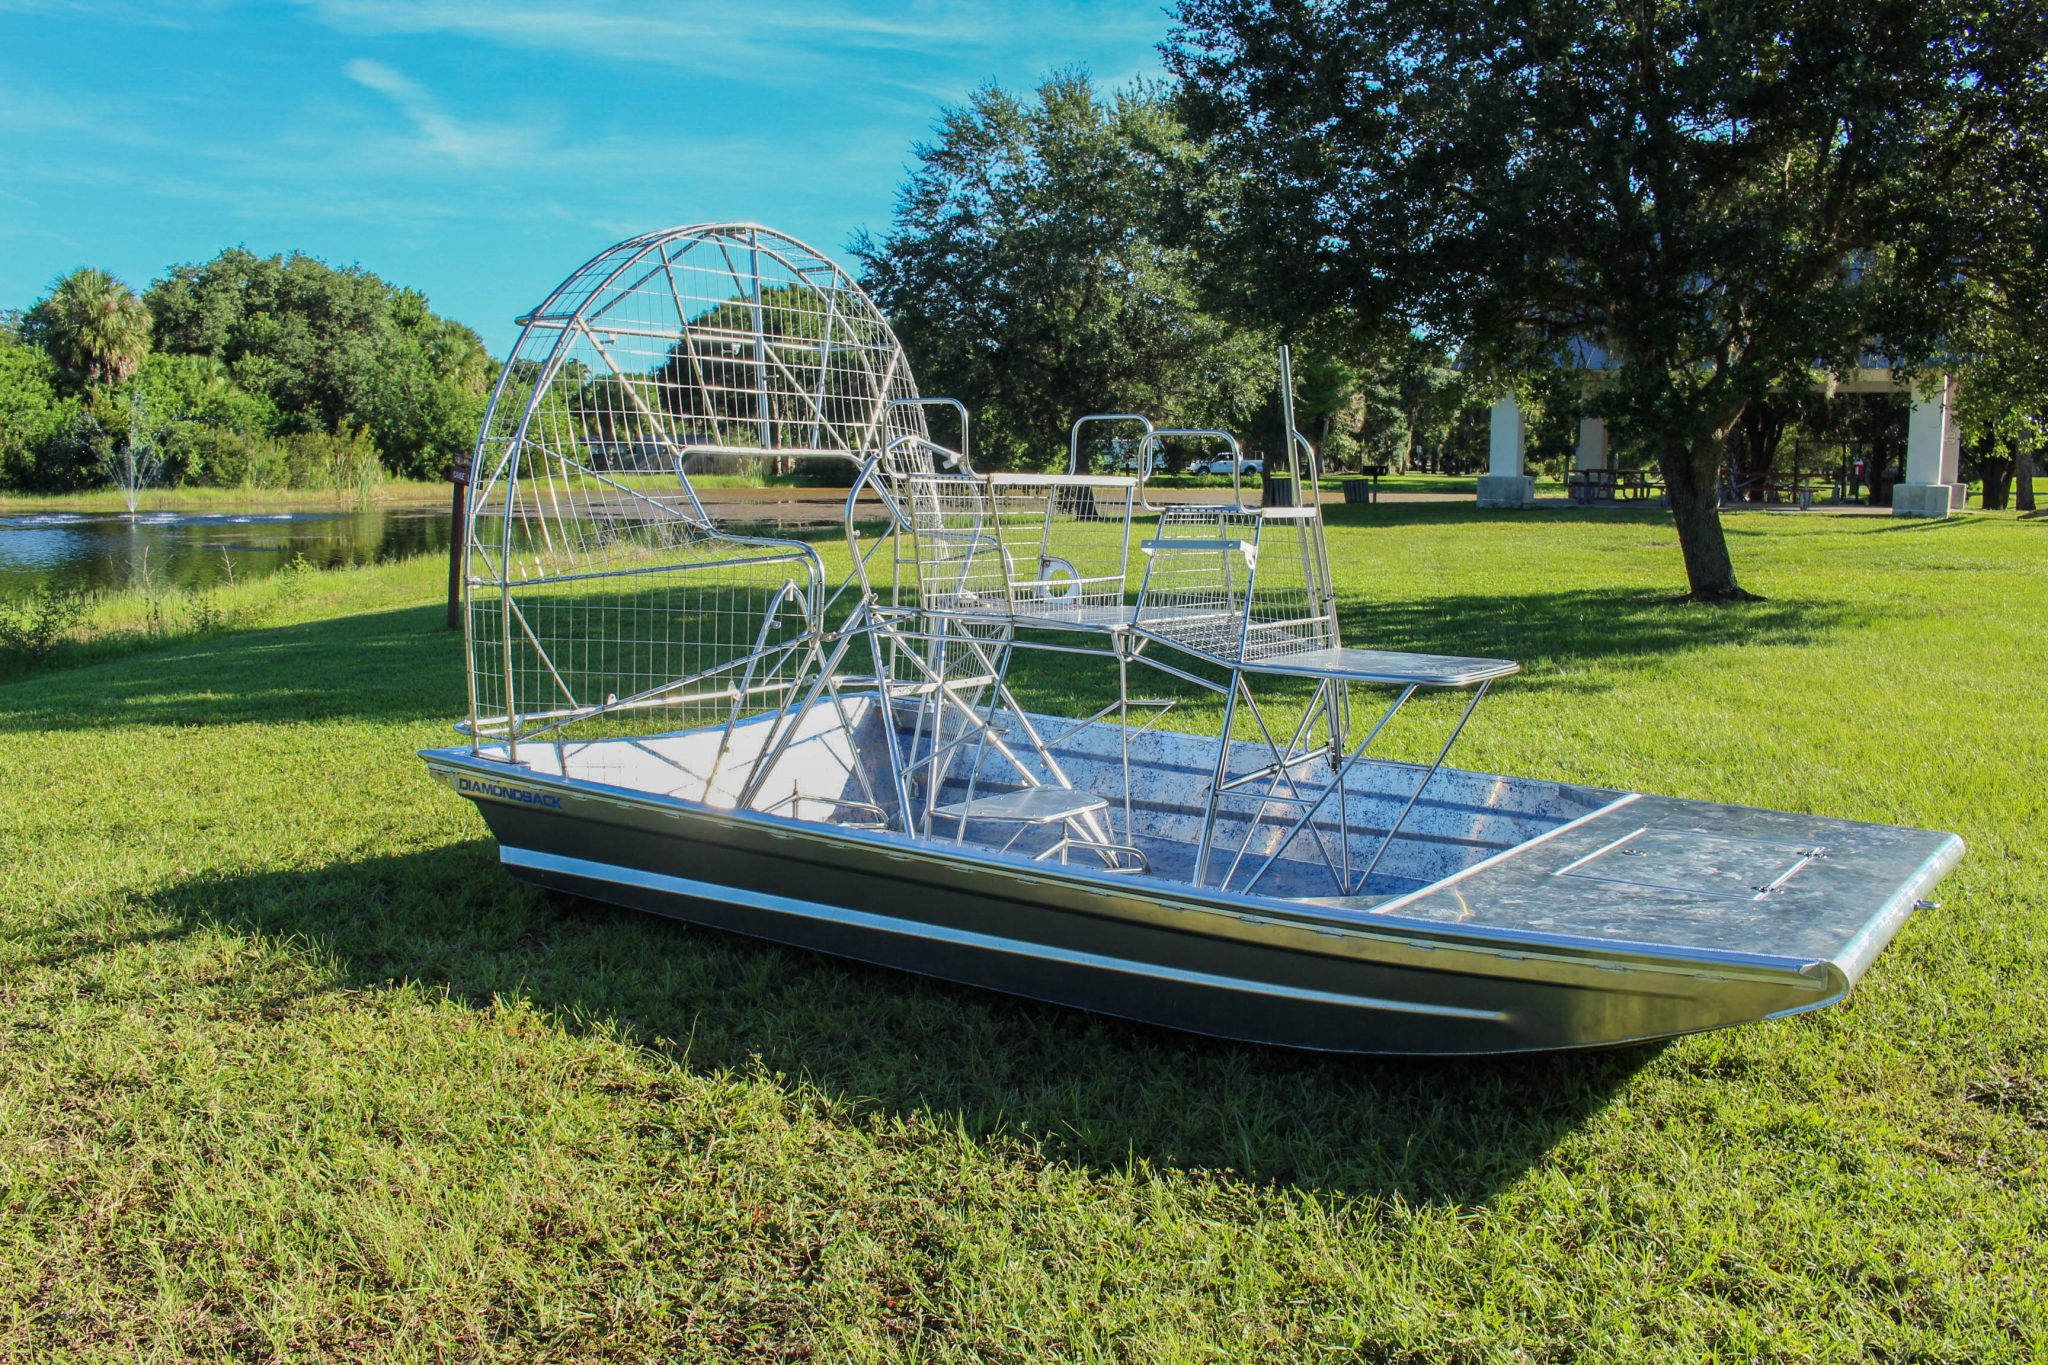 KIT BOAT 3 – Diamondback Airboats